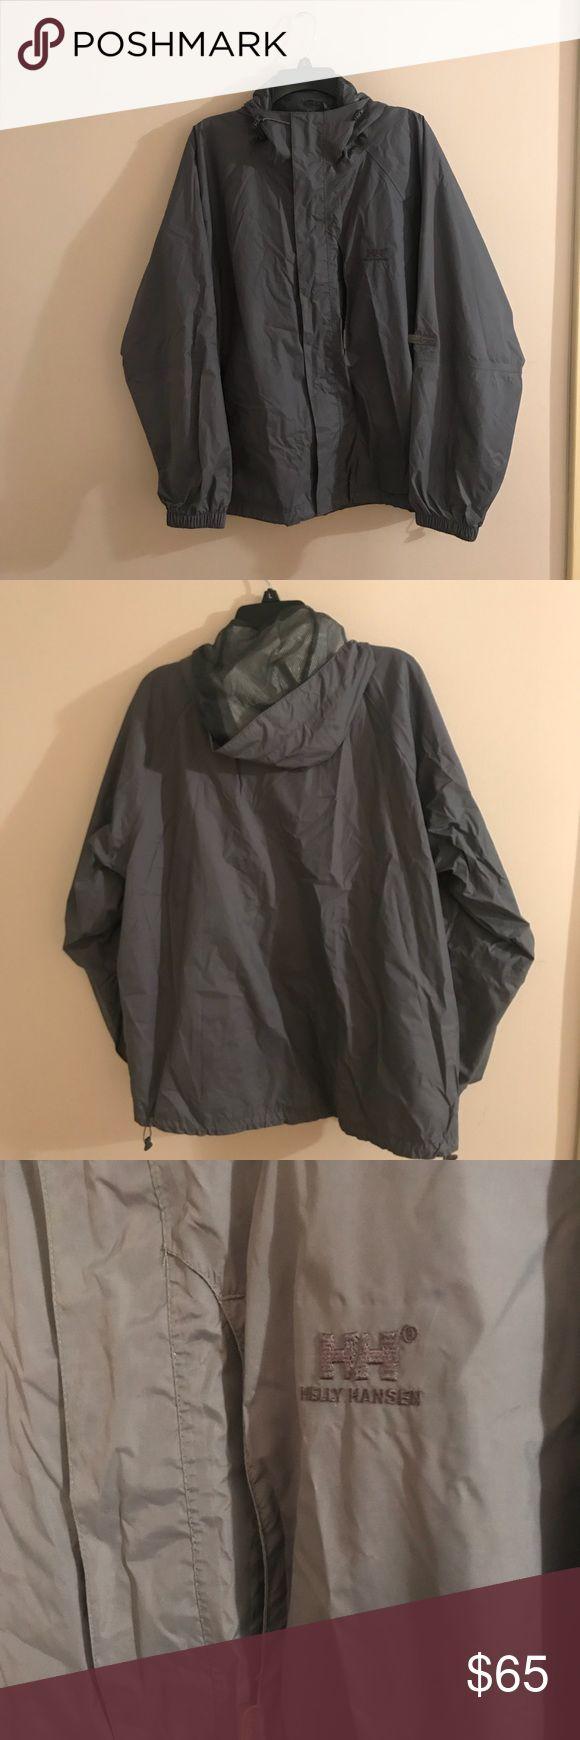 Helly Hansen Men's Rain Coat. Grey. Size L. Grey Helly Hansen men's rain coat. Some signs of slight wear. Size Large. Helly Hansen Jackets & Coats Raincoats